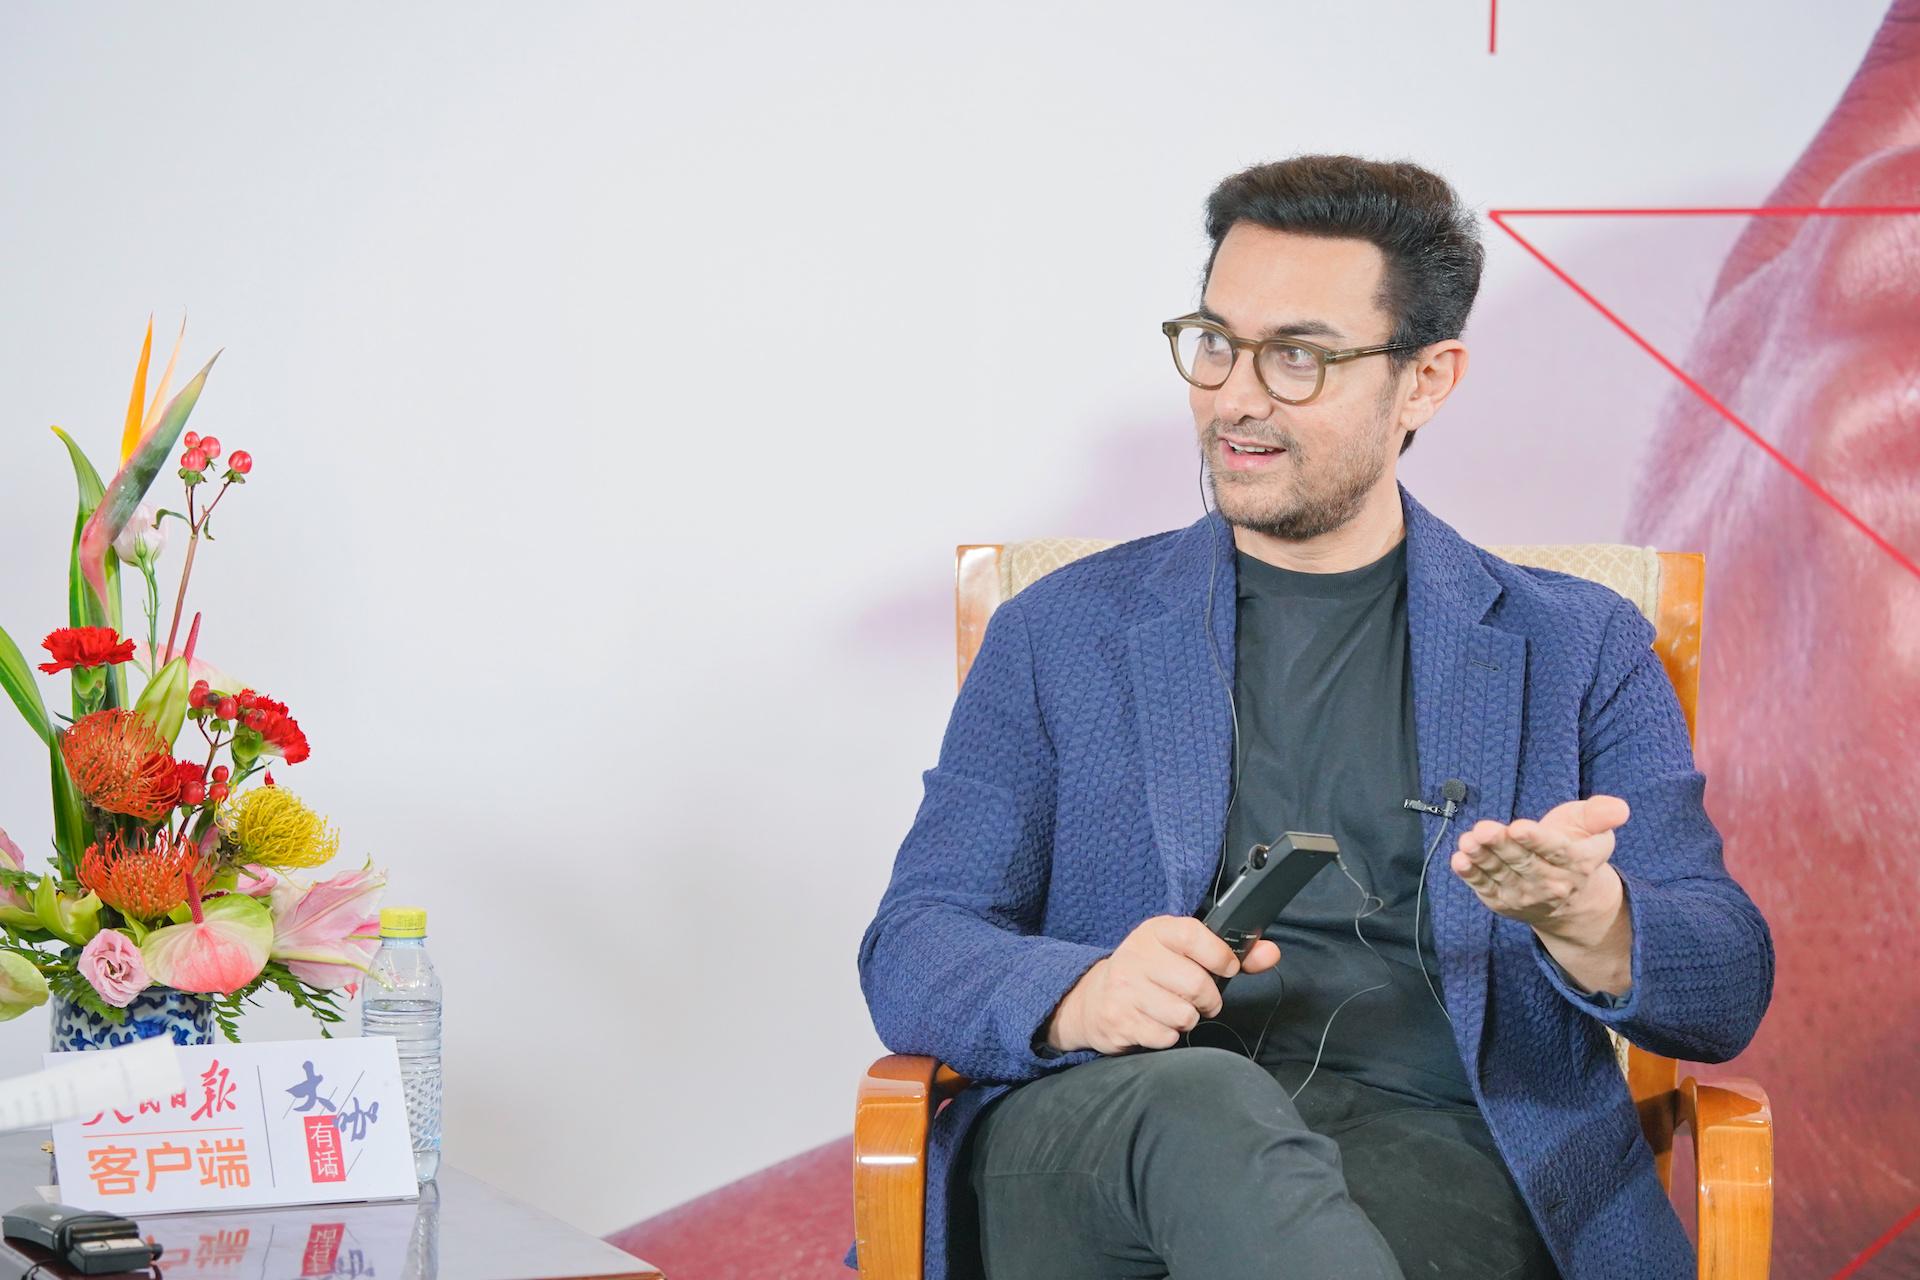 Video | Aamir Khan: 'Films bring people together'